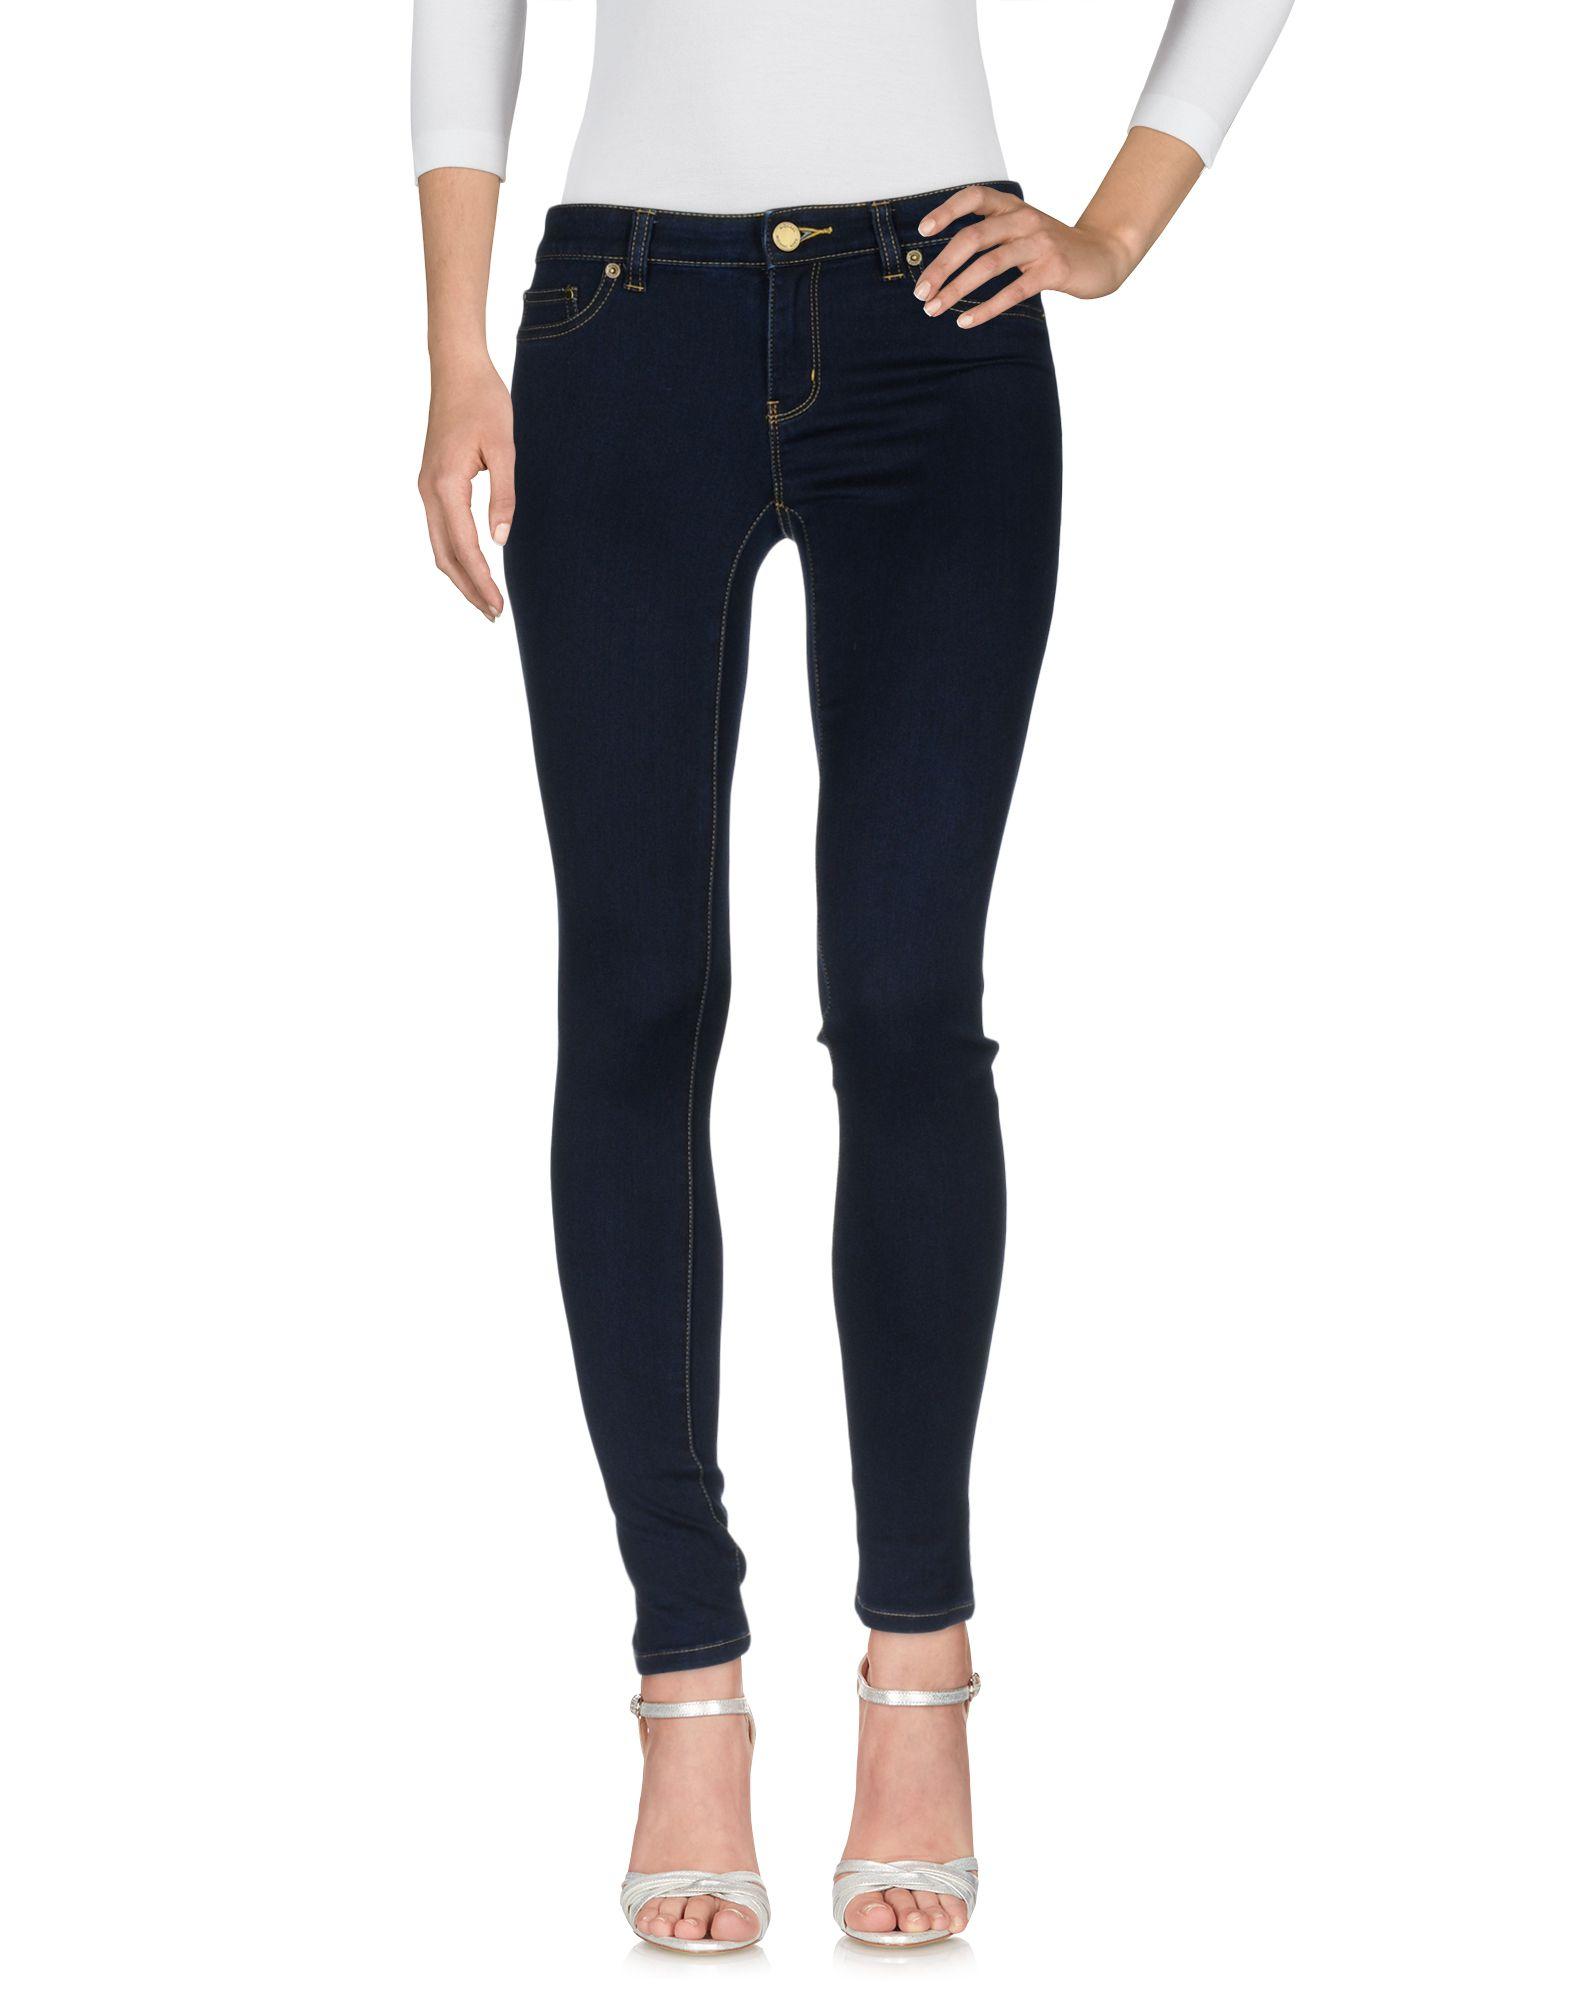 MICHAEL KORS Damen Jeanshose Farbe Blau Größe 2